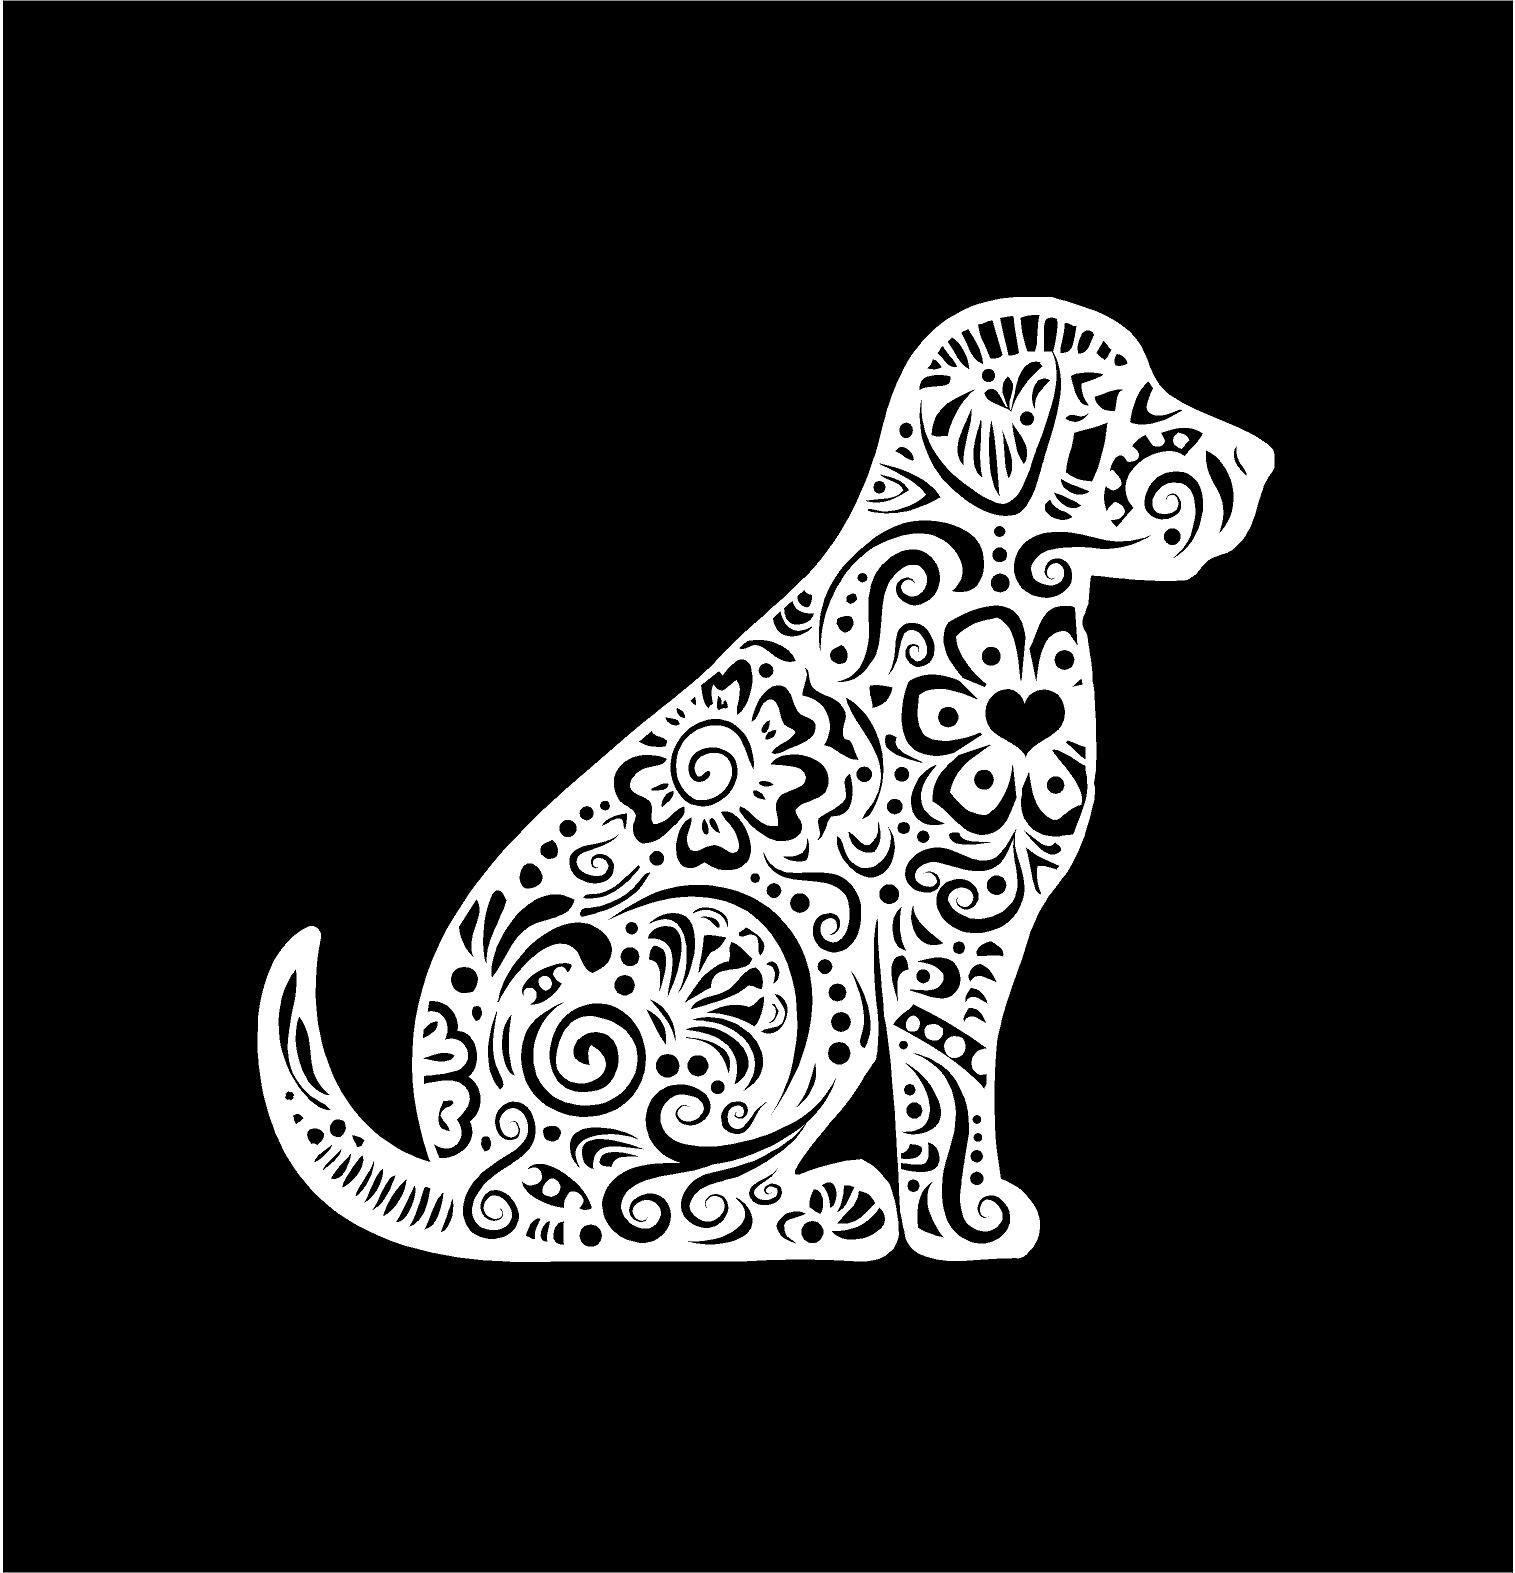 Car Window Sticker Golden Retriever Dog Decal Sign Labrador on Board V11